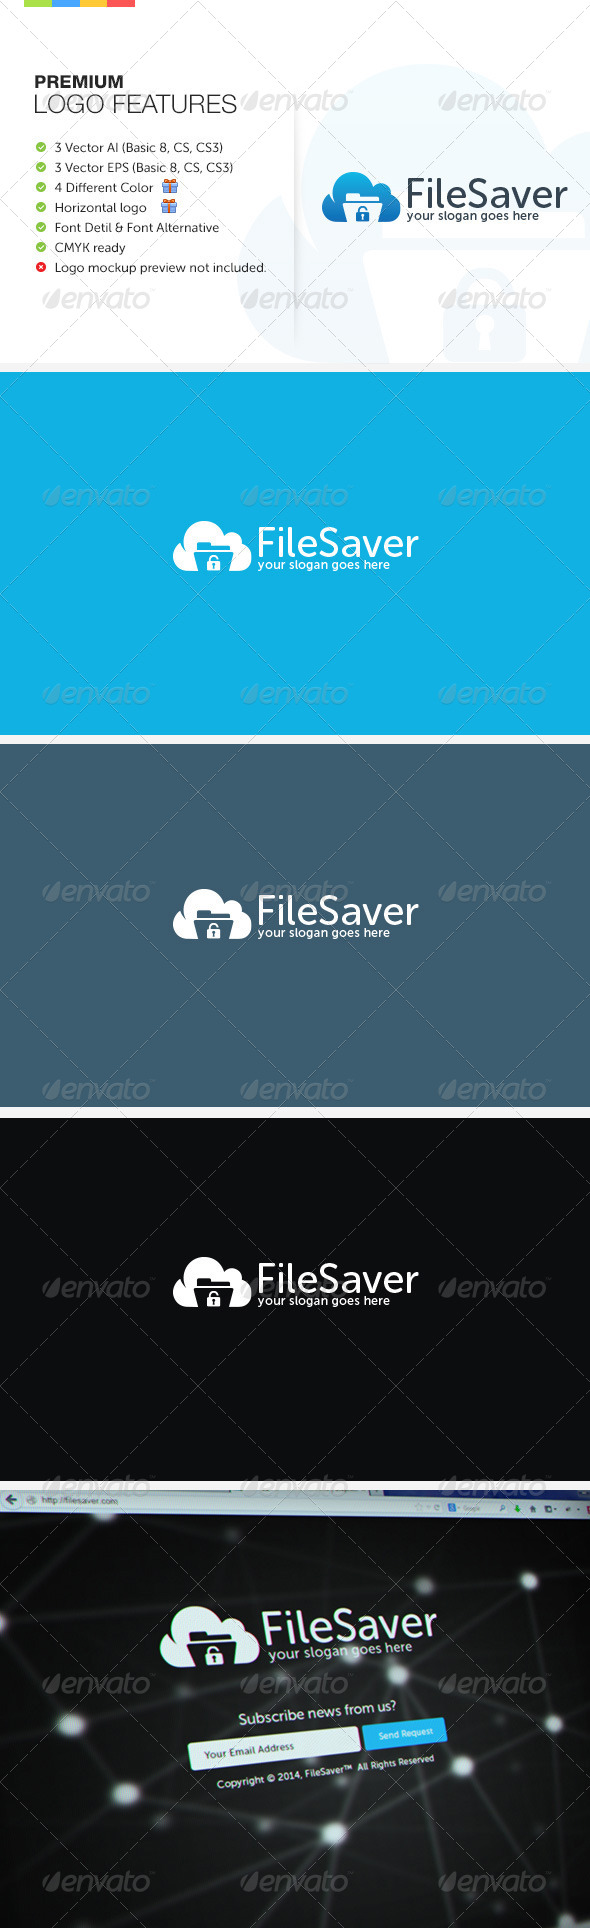 GraphicRiver File Saver Logo 7376469